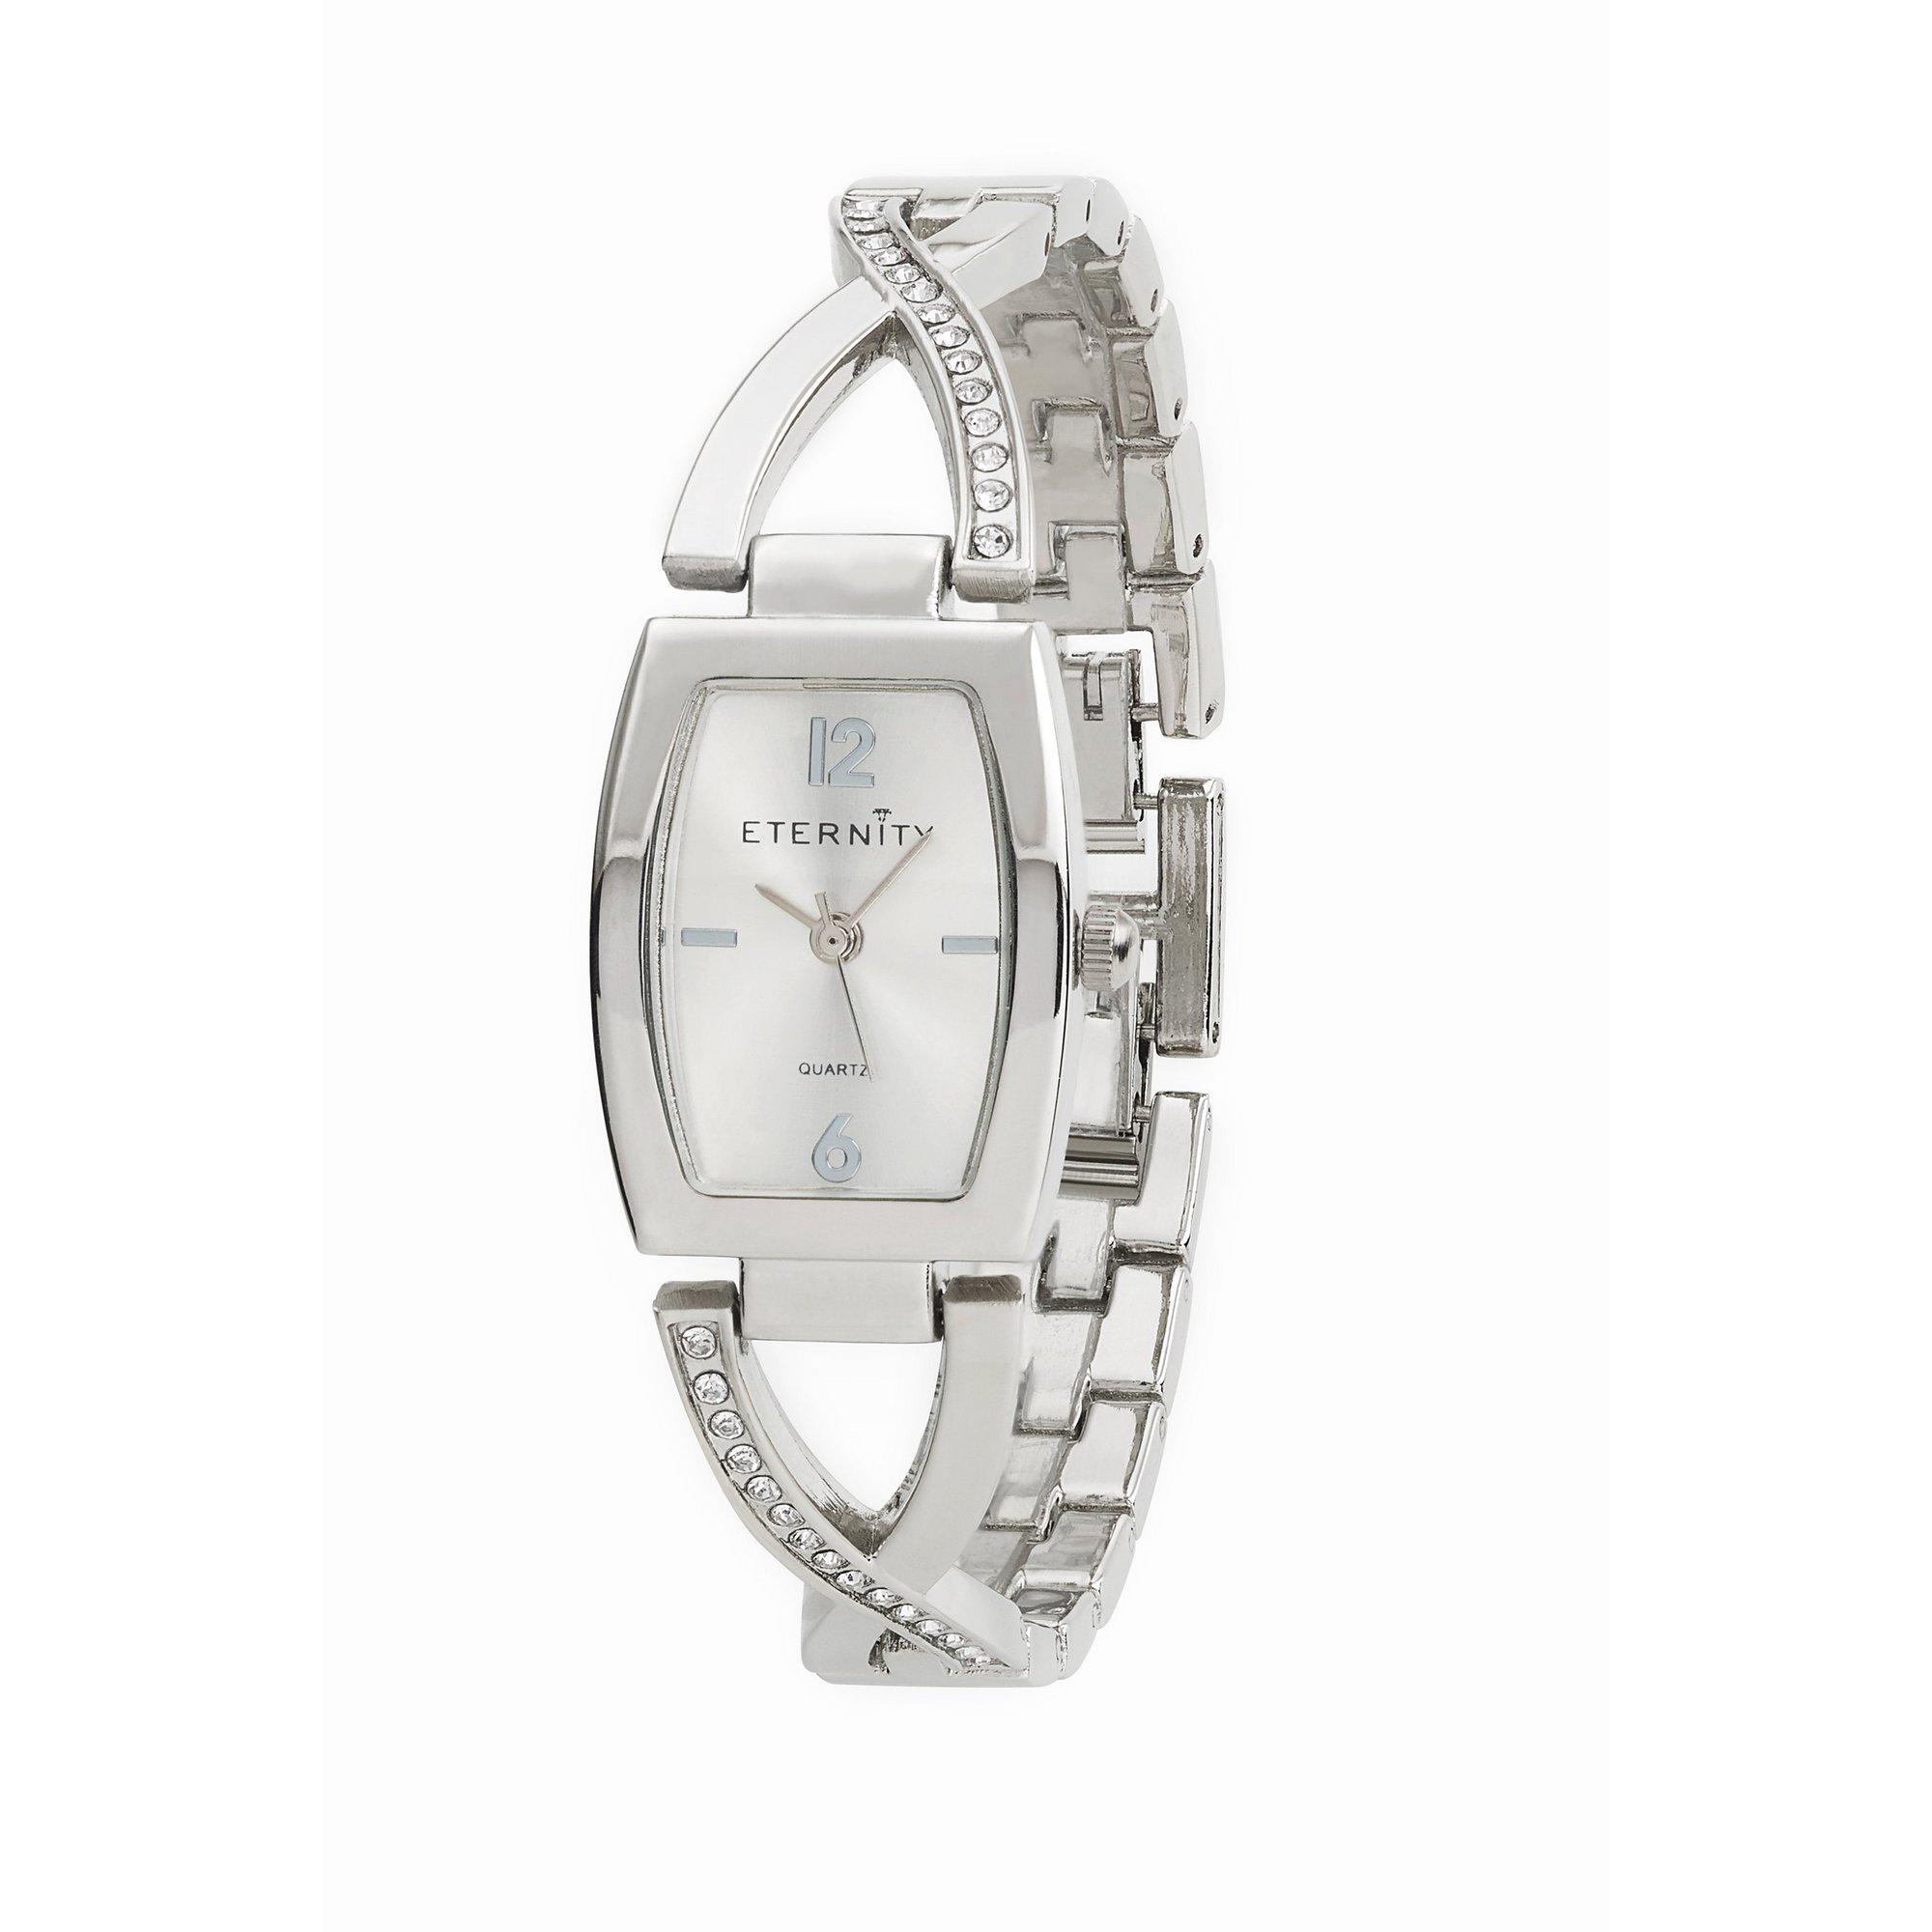 Image of Eternity Ladies Silver Tone Bracelet Watch